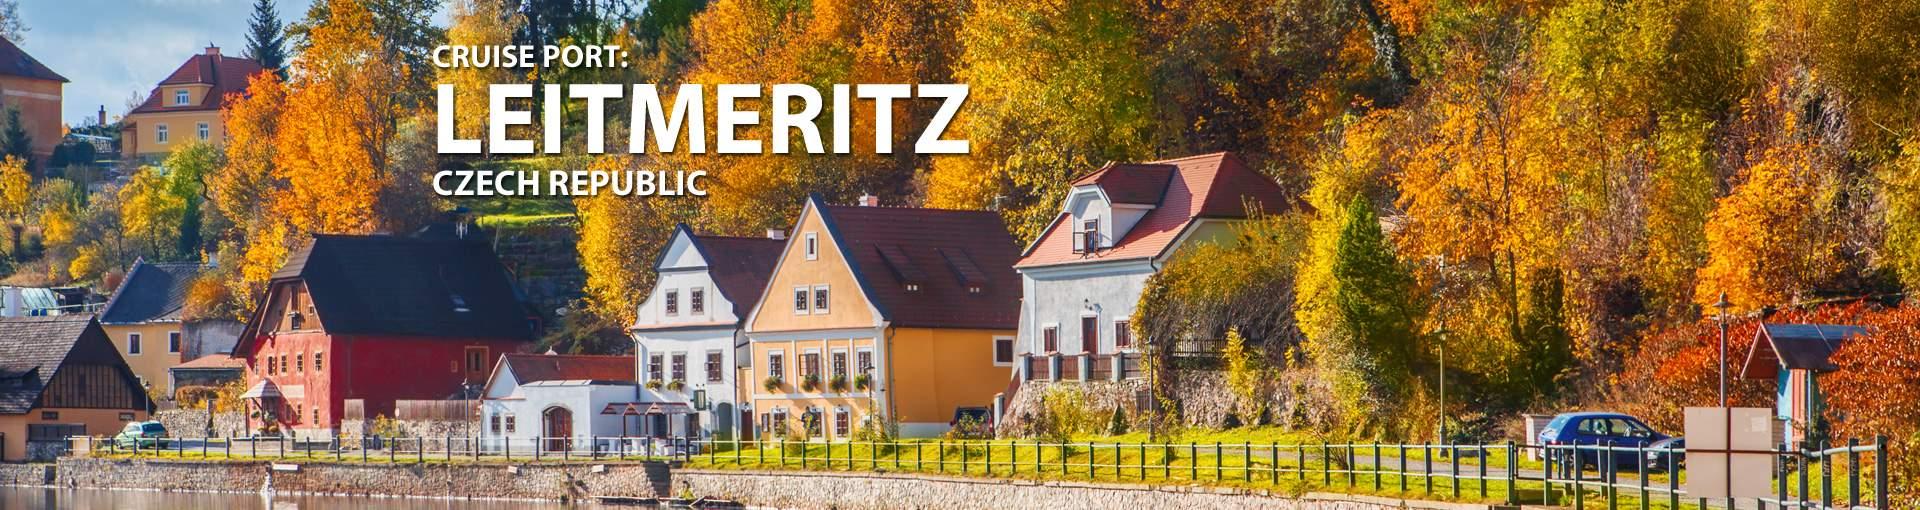 Cruises to Leitmeritz, Czech Republic